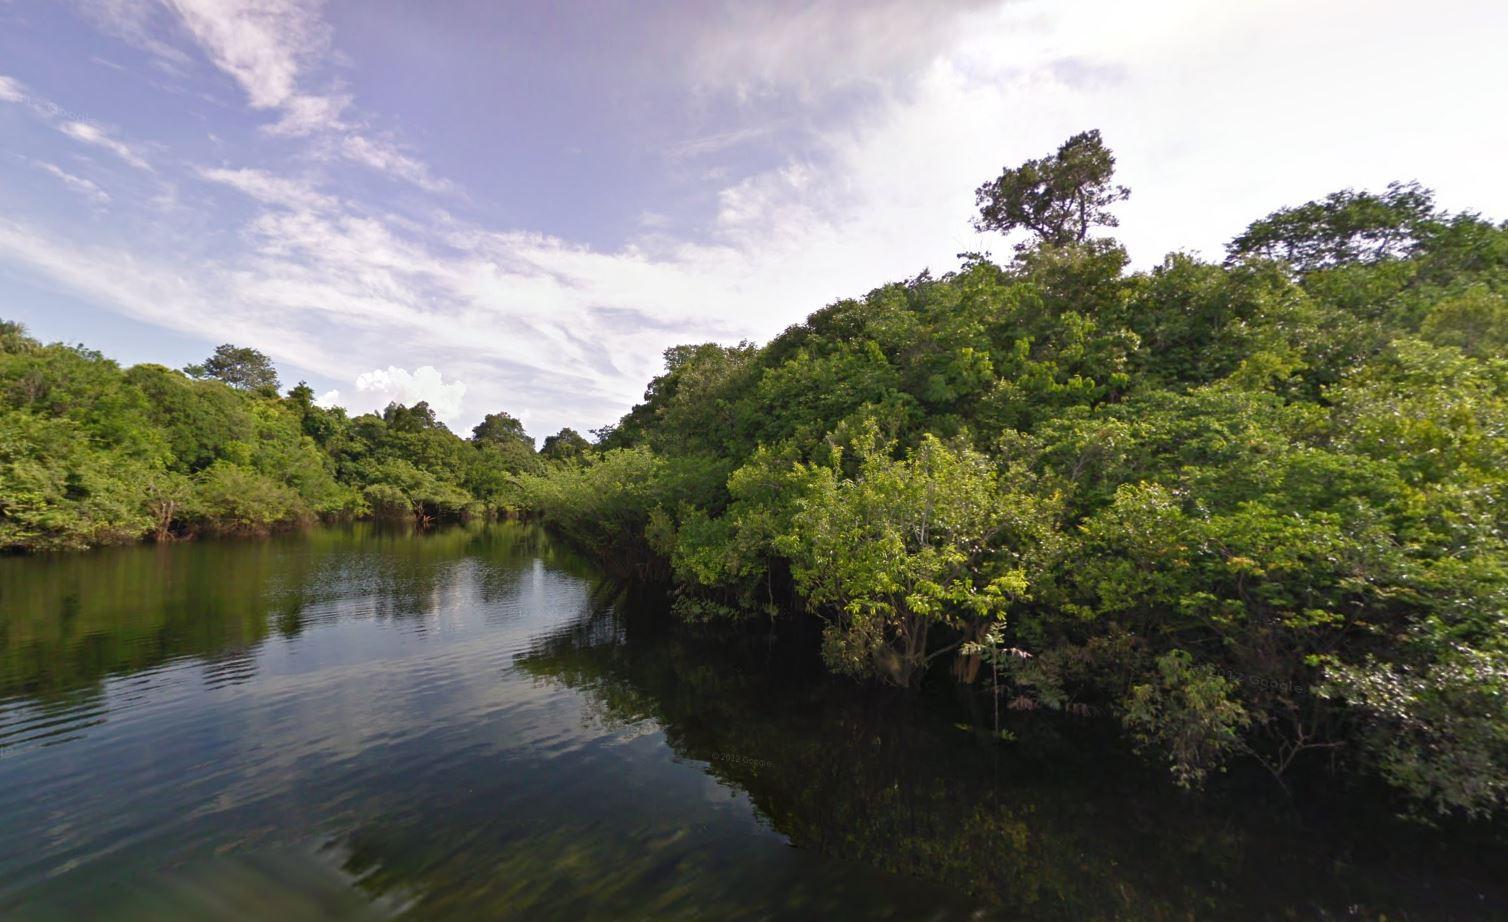 Amazon Rainforest Google Street View